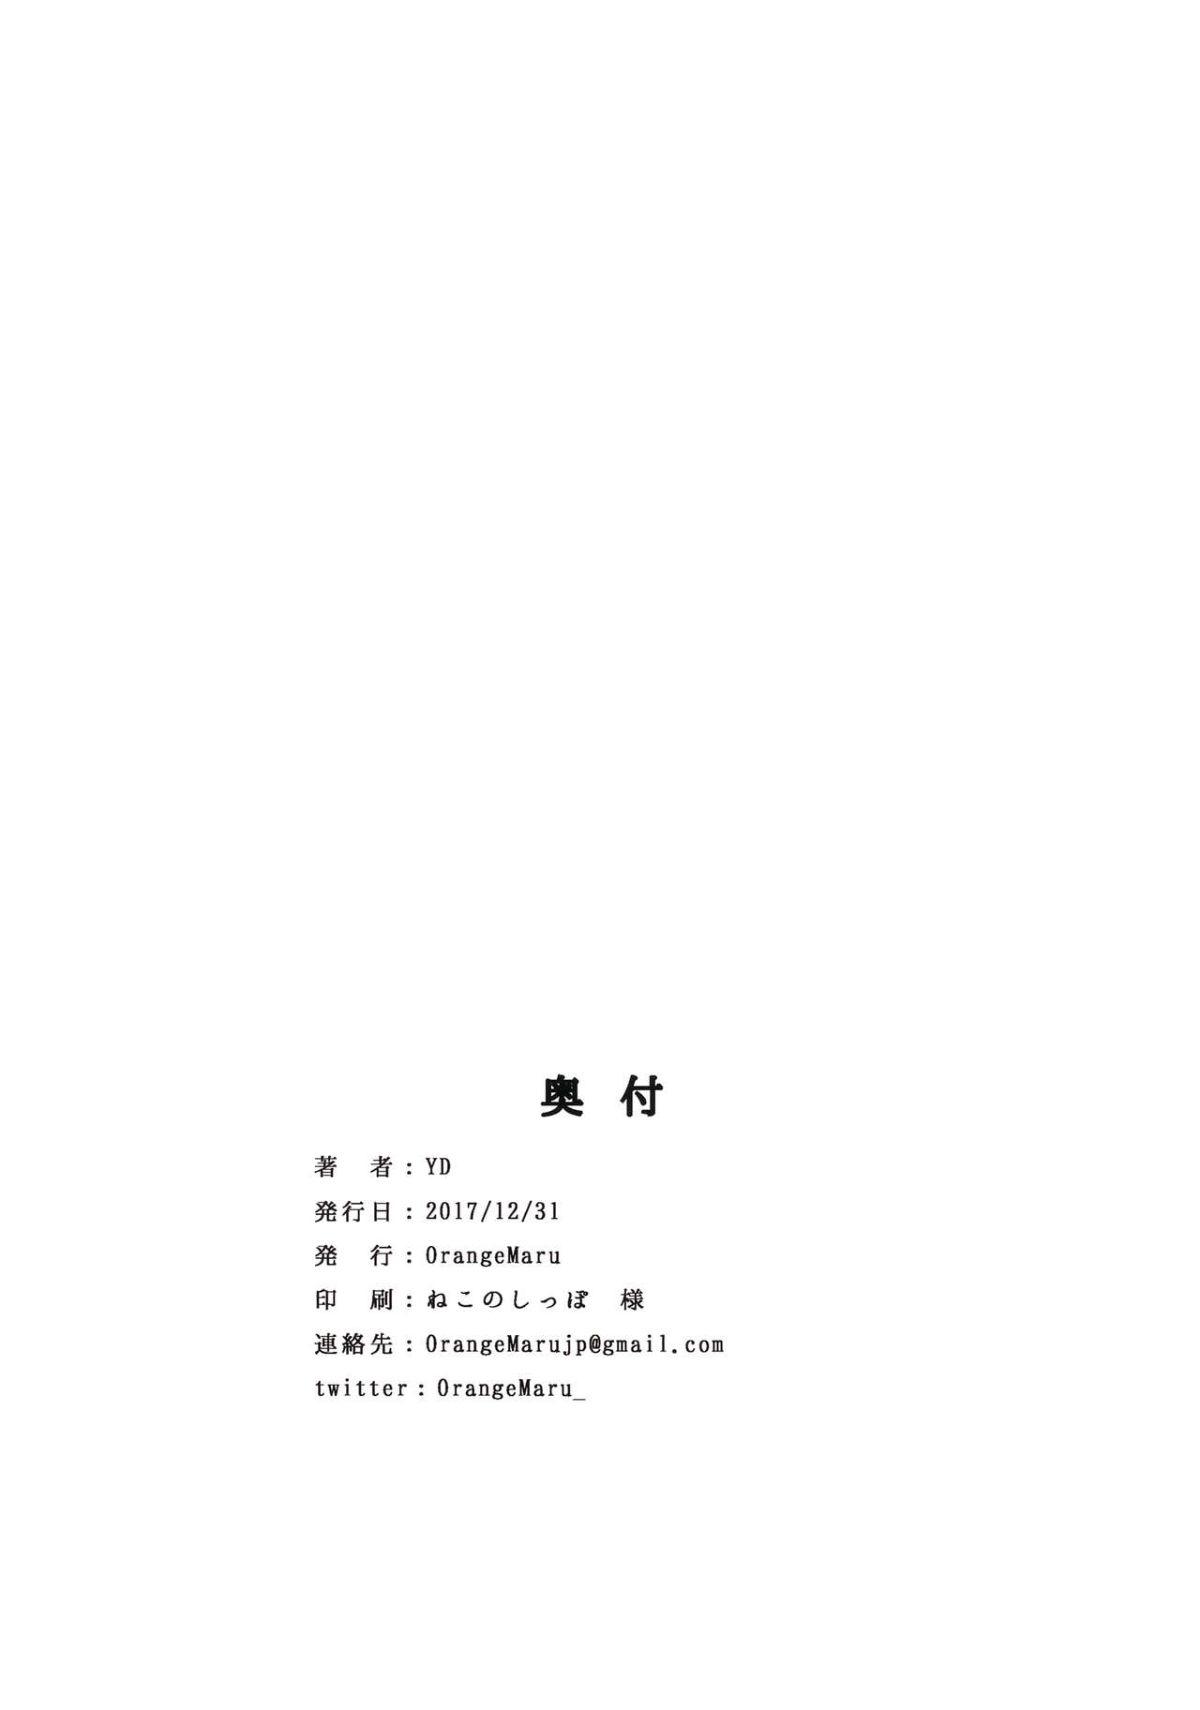 MJK_18_T877_029.jpg